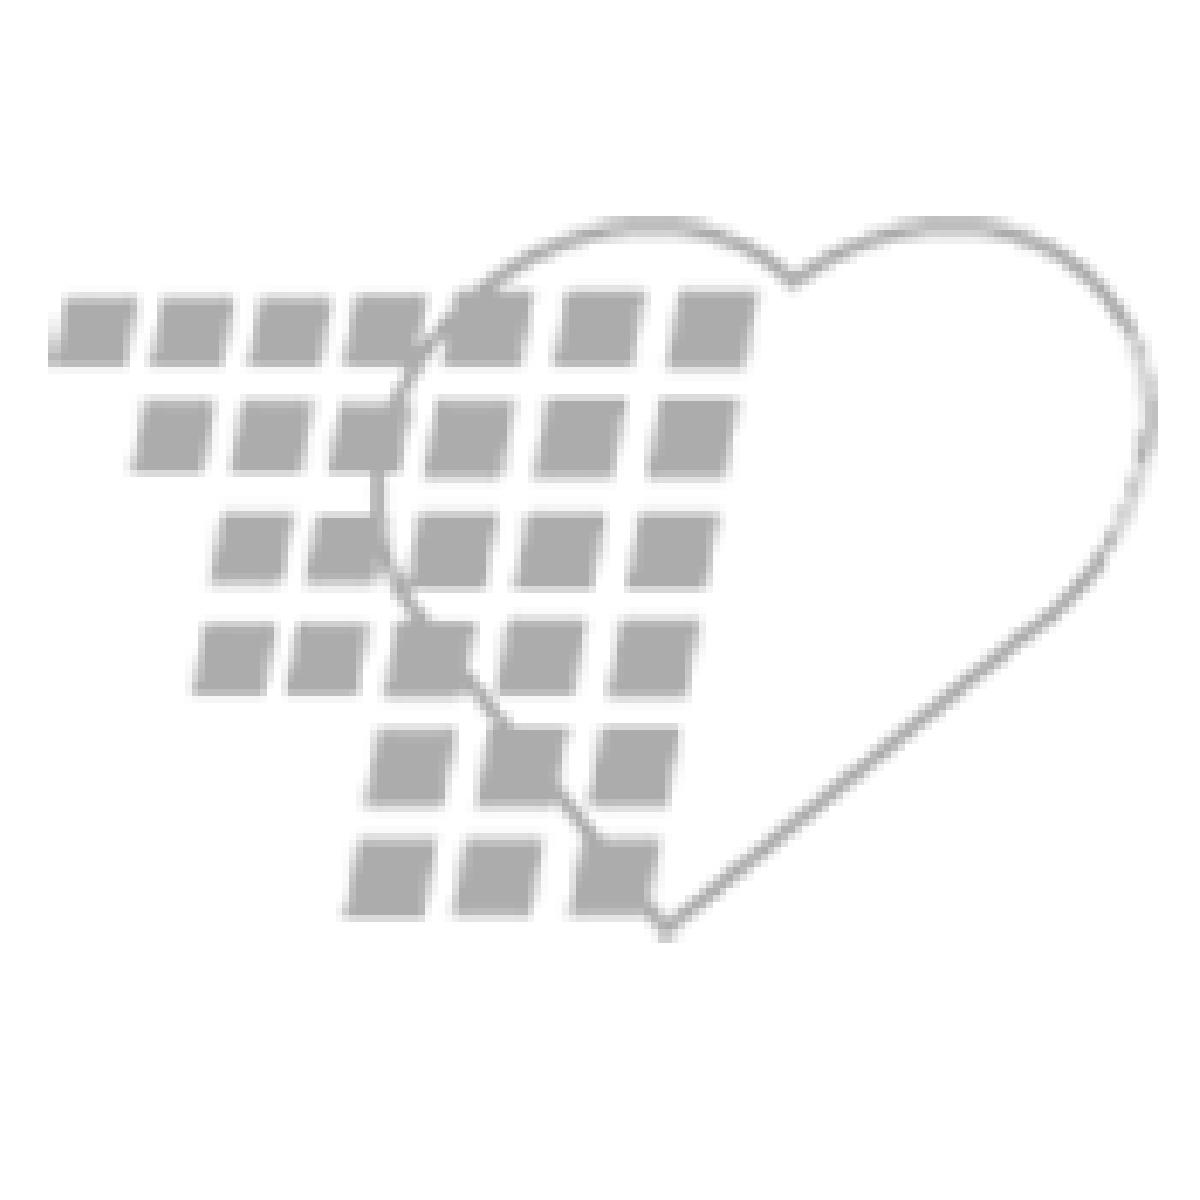 04-25-8210 Isolation Cart, 4 Drawer-Yellow